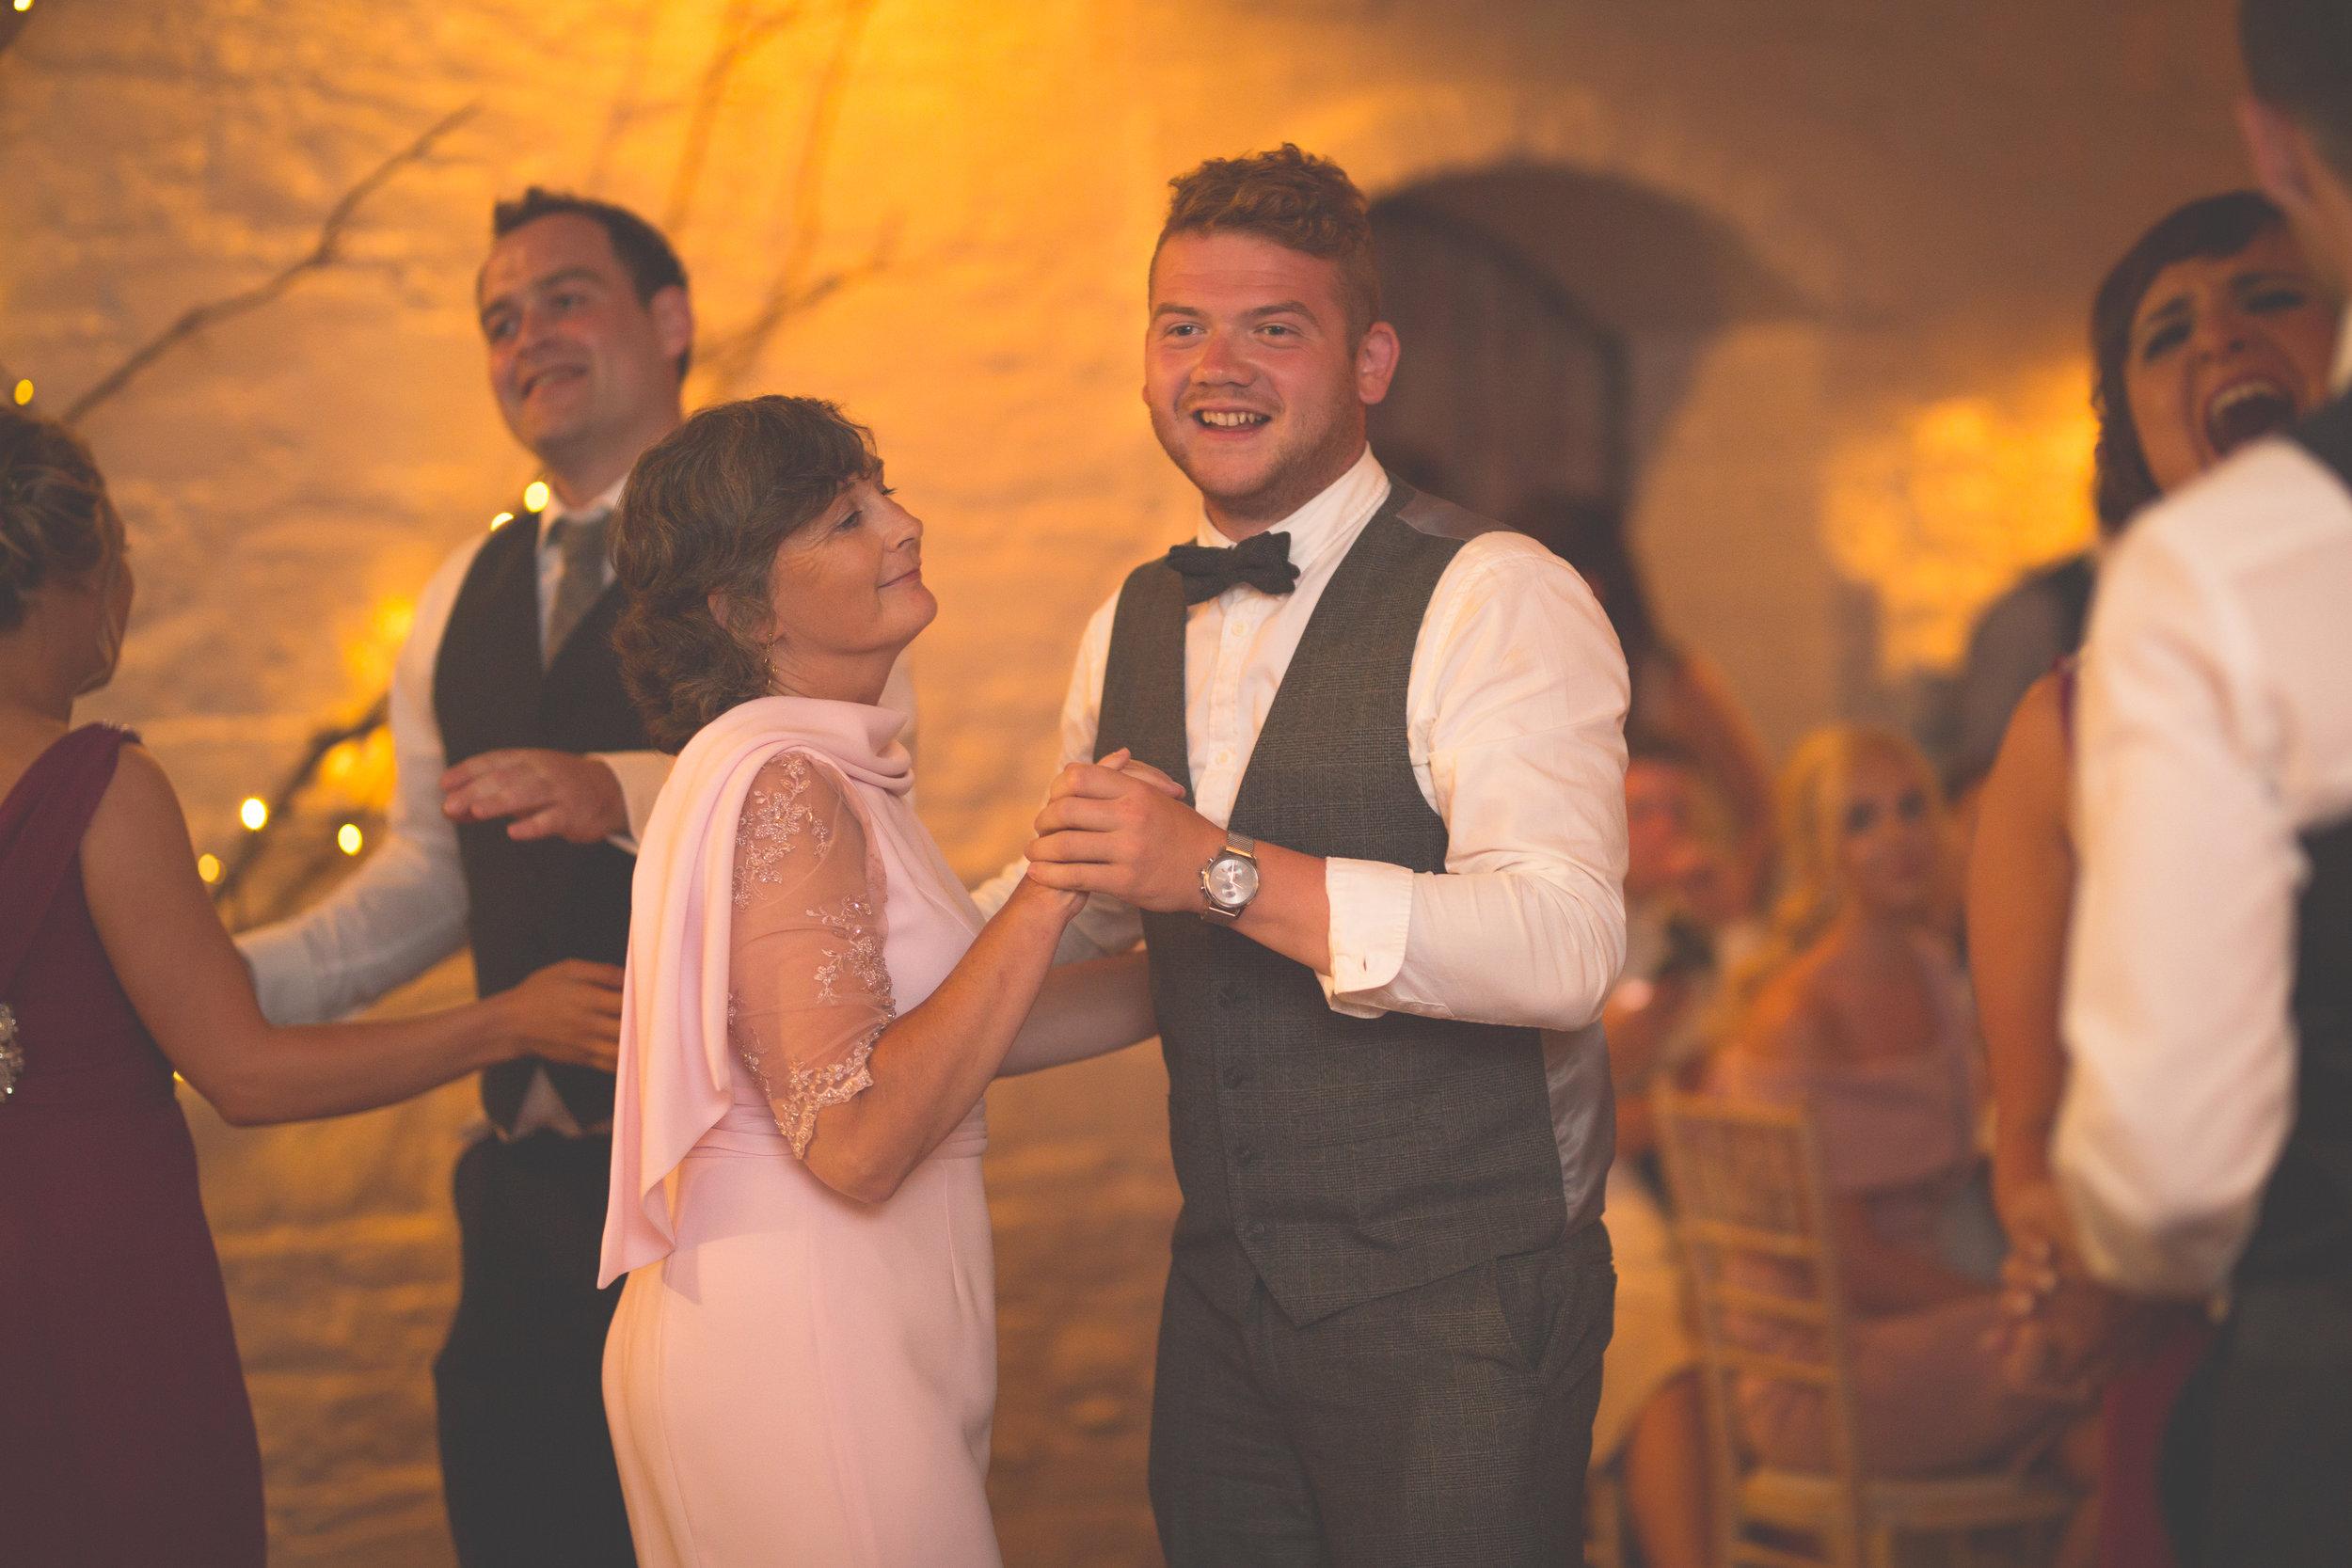 Brian McEwan Wedding Photography | Carol-Annee & Sean | The Dancing-46.jpg